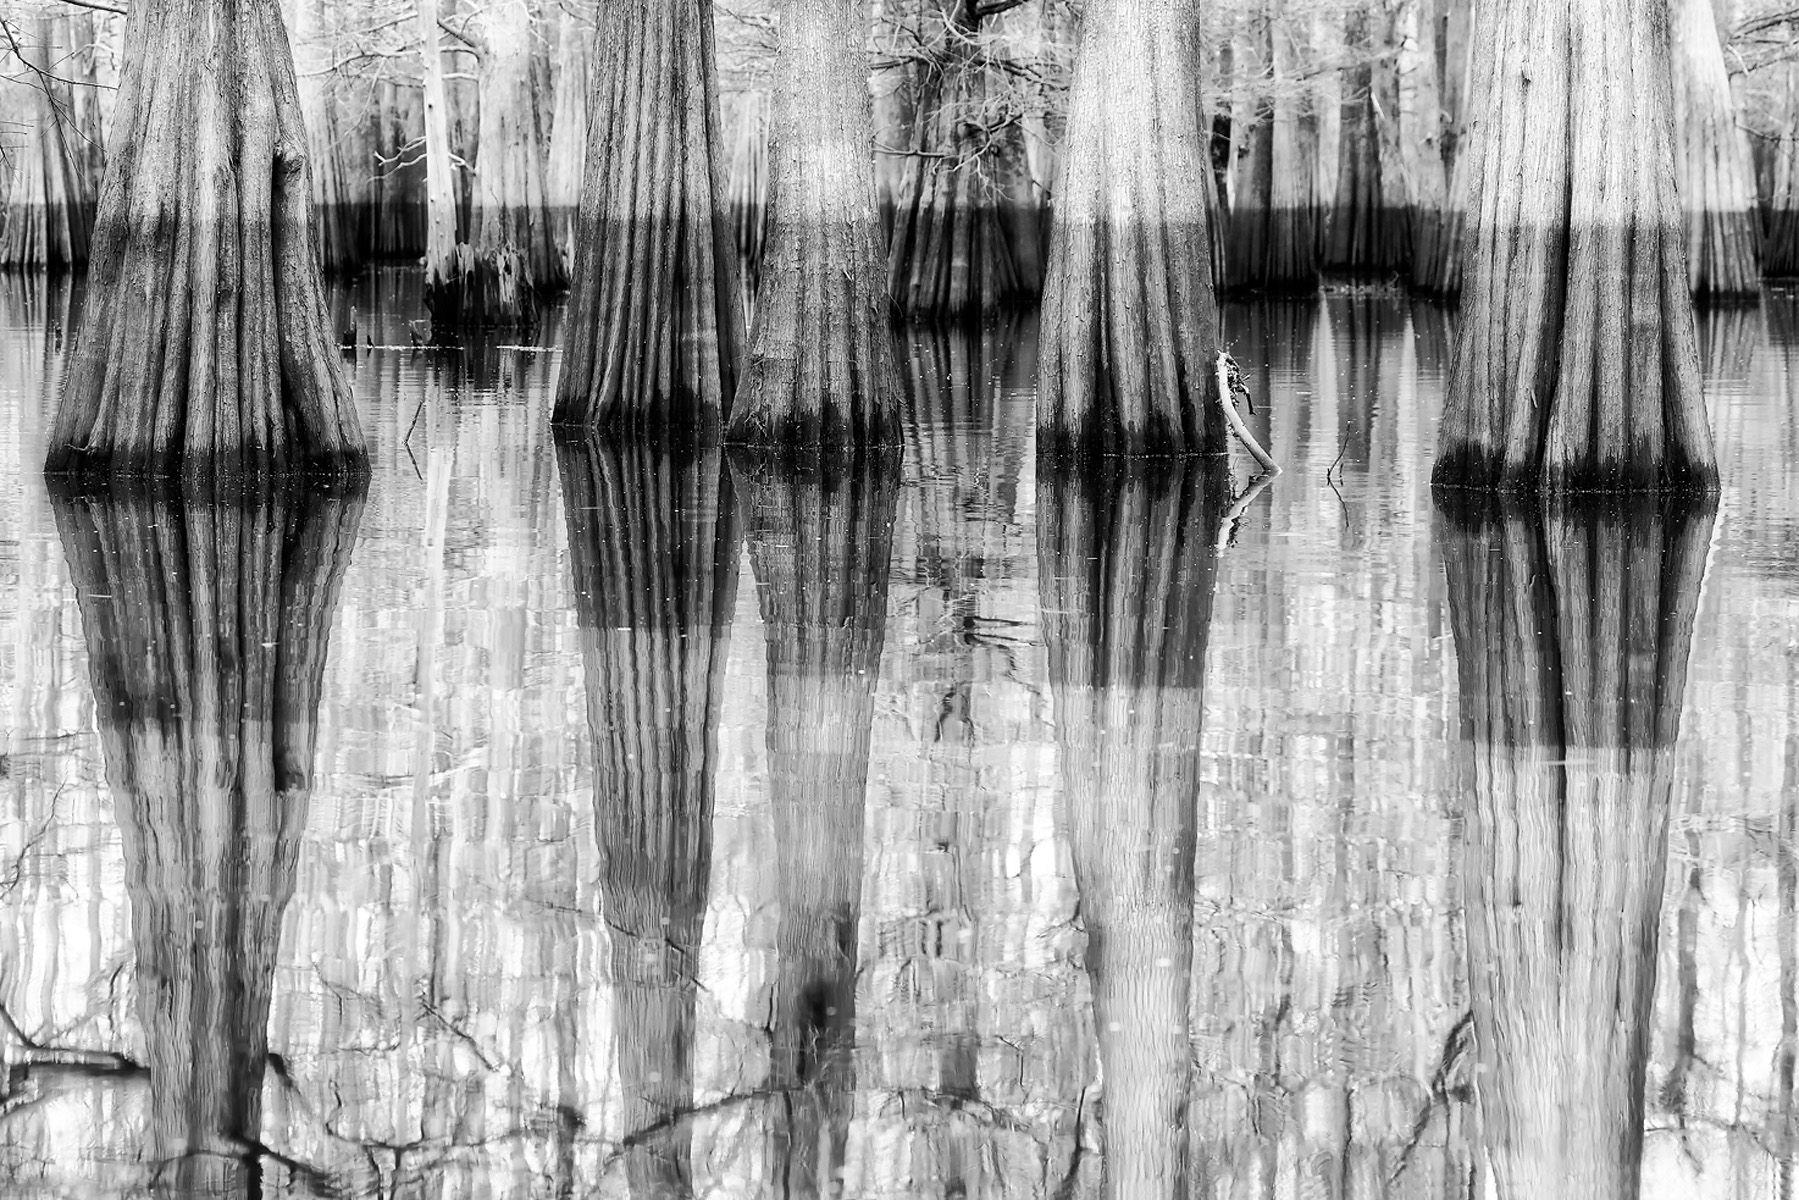 Cypress tree reflections_B&W II_A3I2565-Atchafalaya Basin, LA, USA.jpg